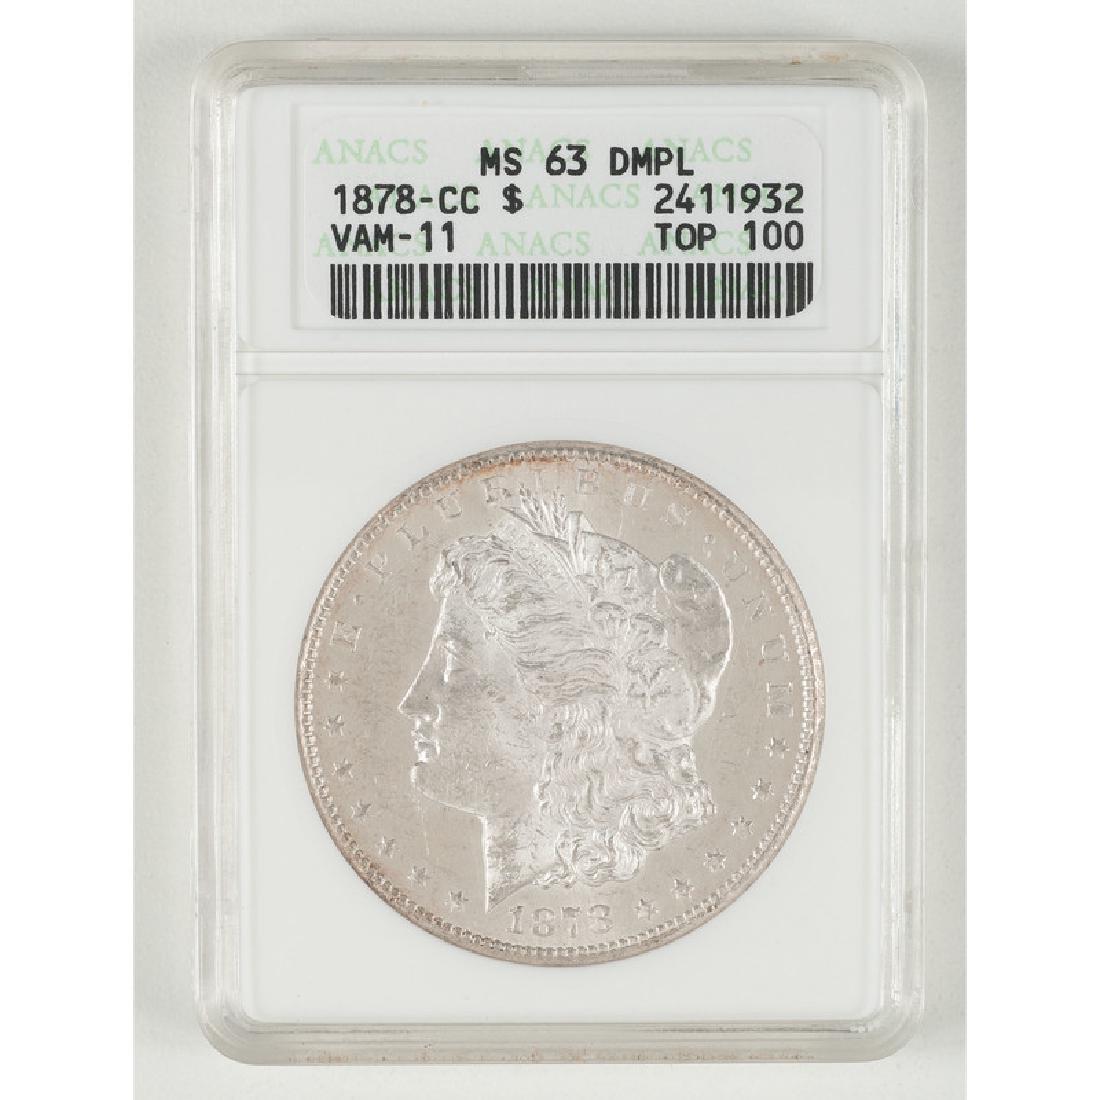 United States Morgan Silver Dollar 1878-CC. ANACS MS63